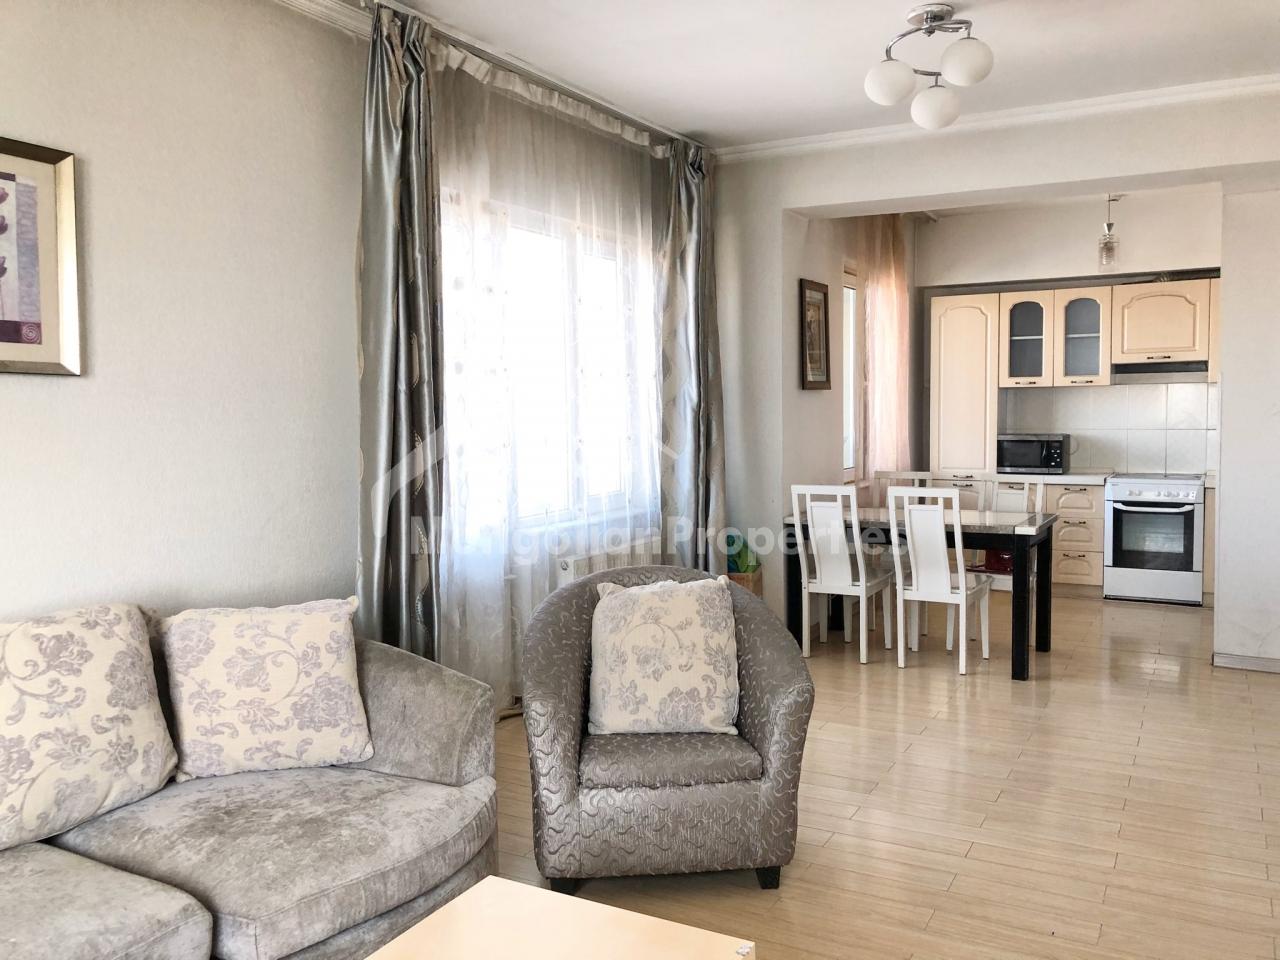 1 bedroom apartment for rent at Golomt Khotkhon